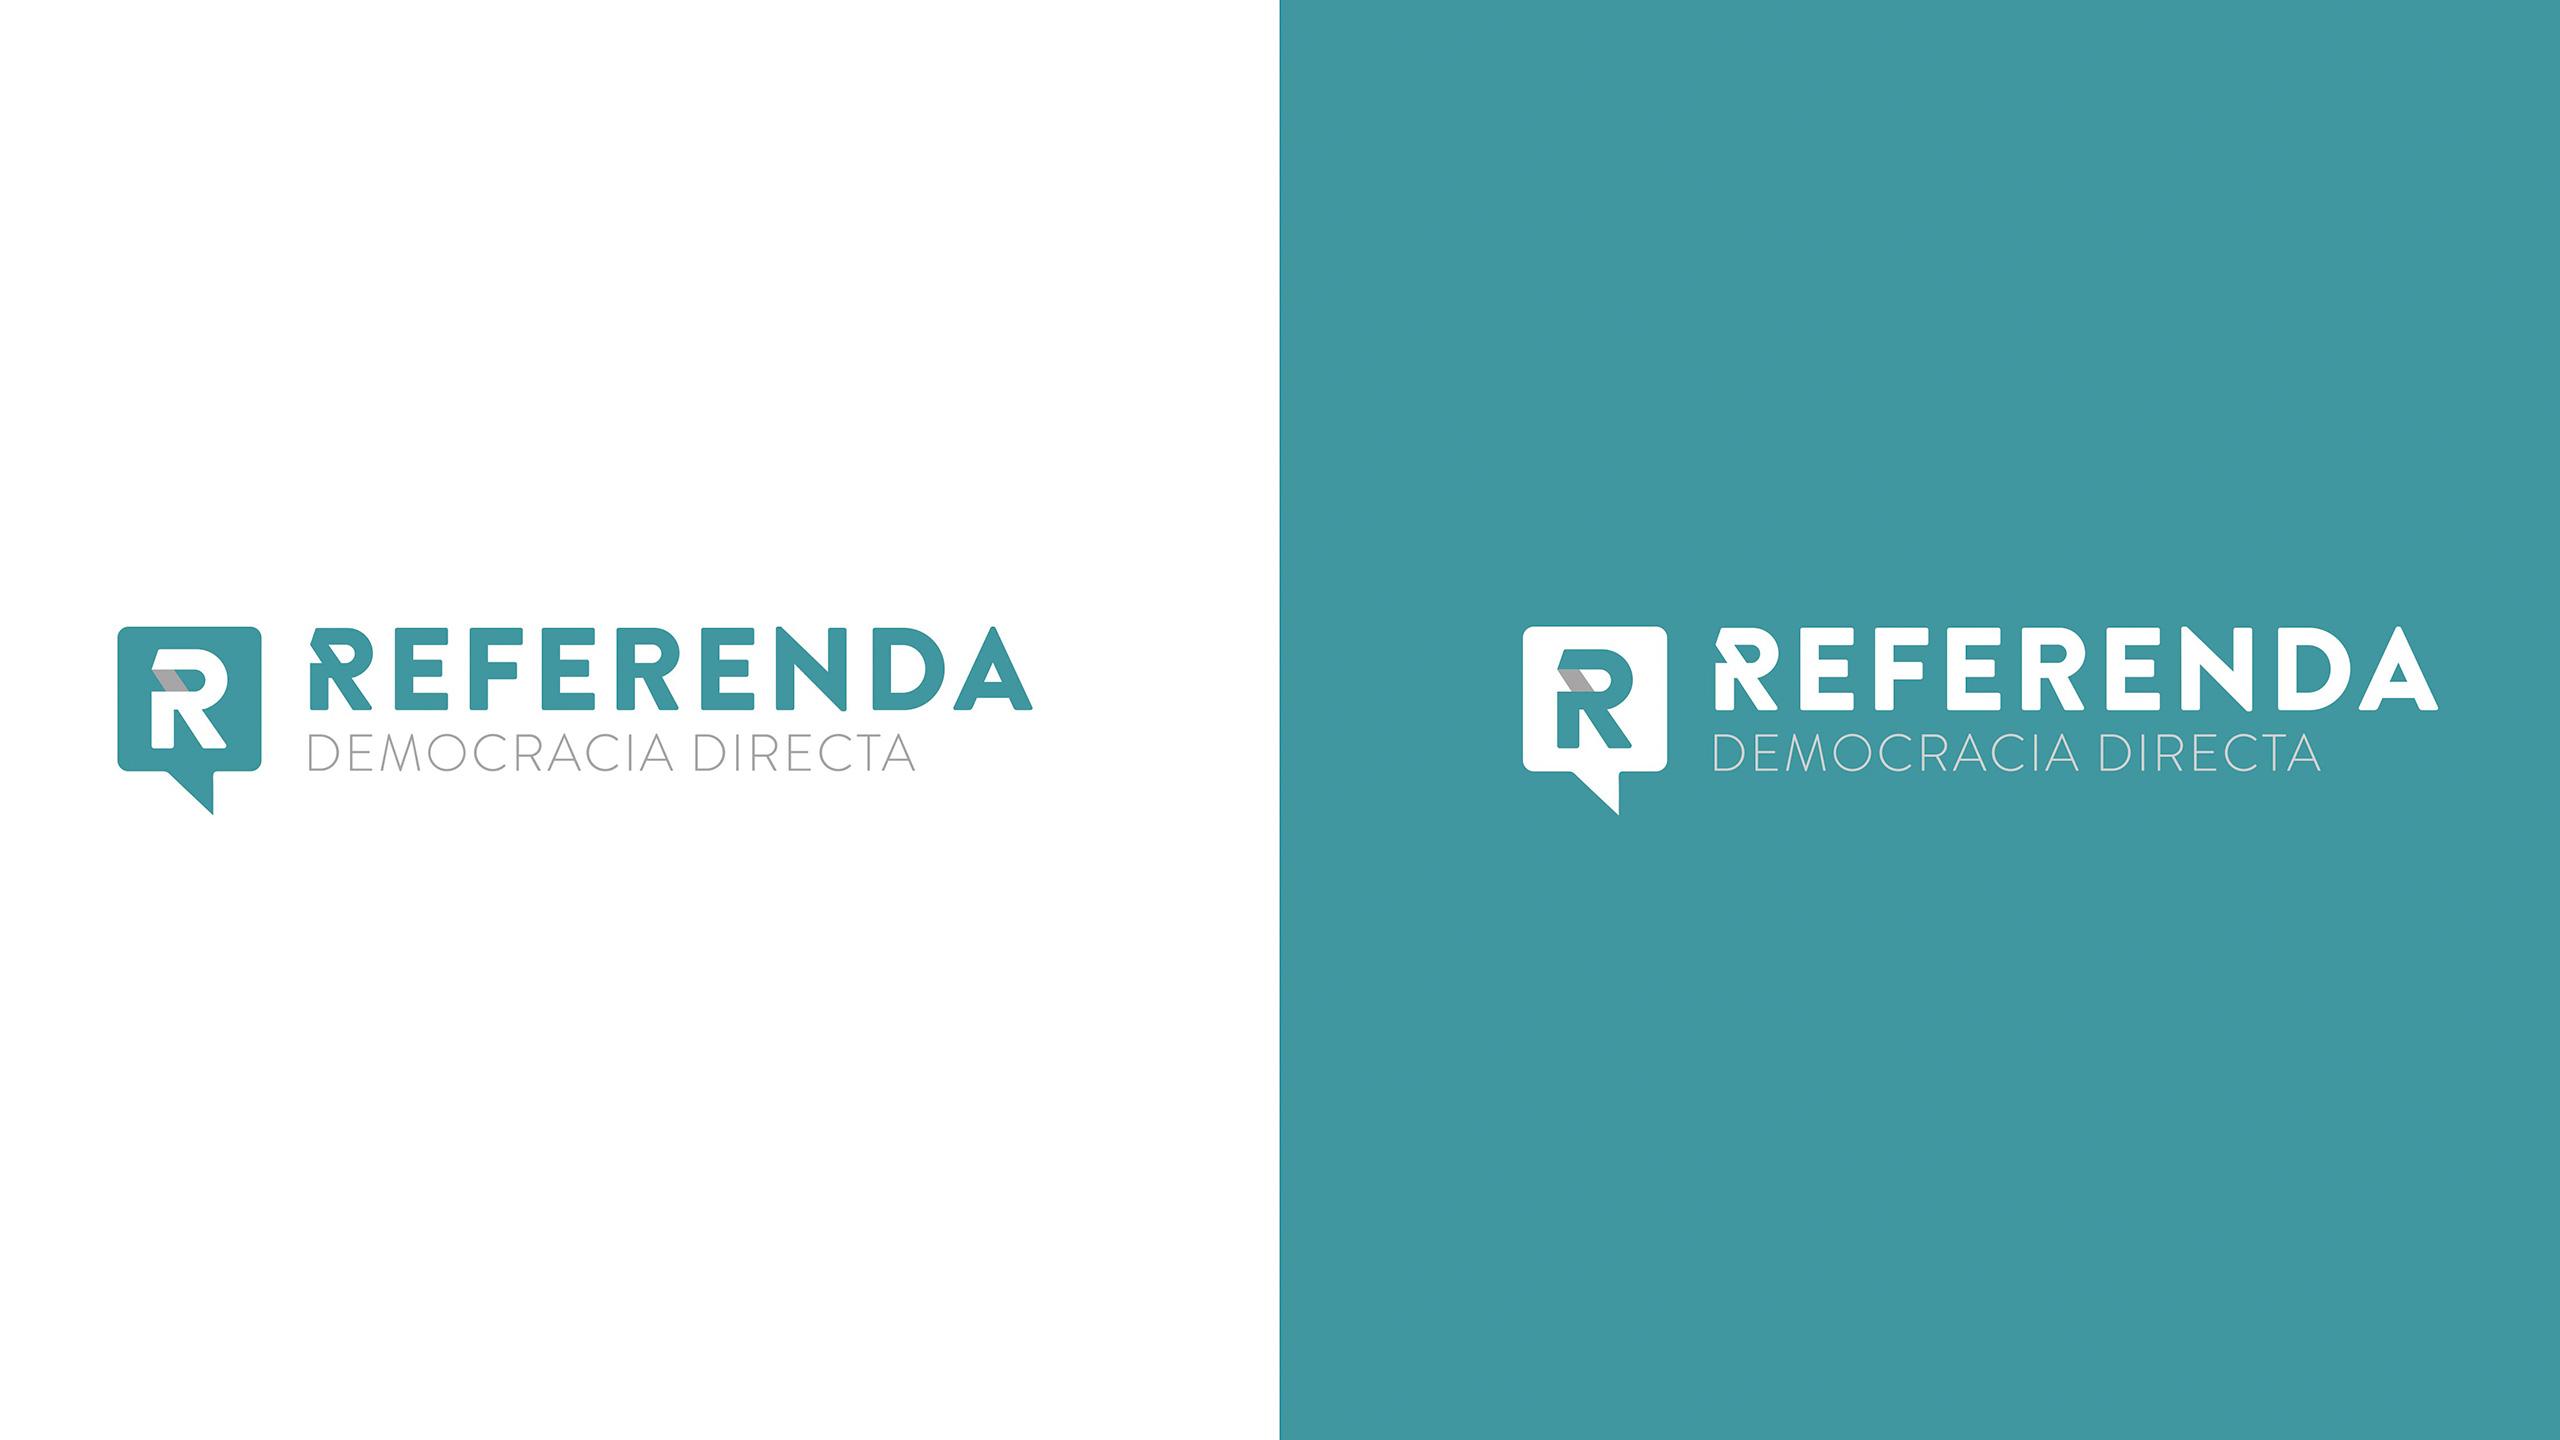 kamikaze_referenda_politica_logotipo_design_04_